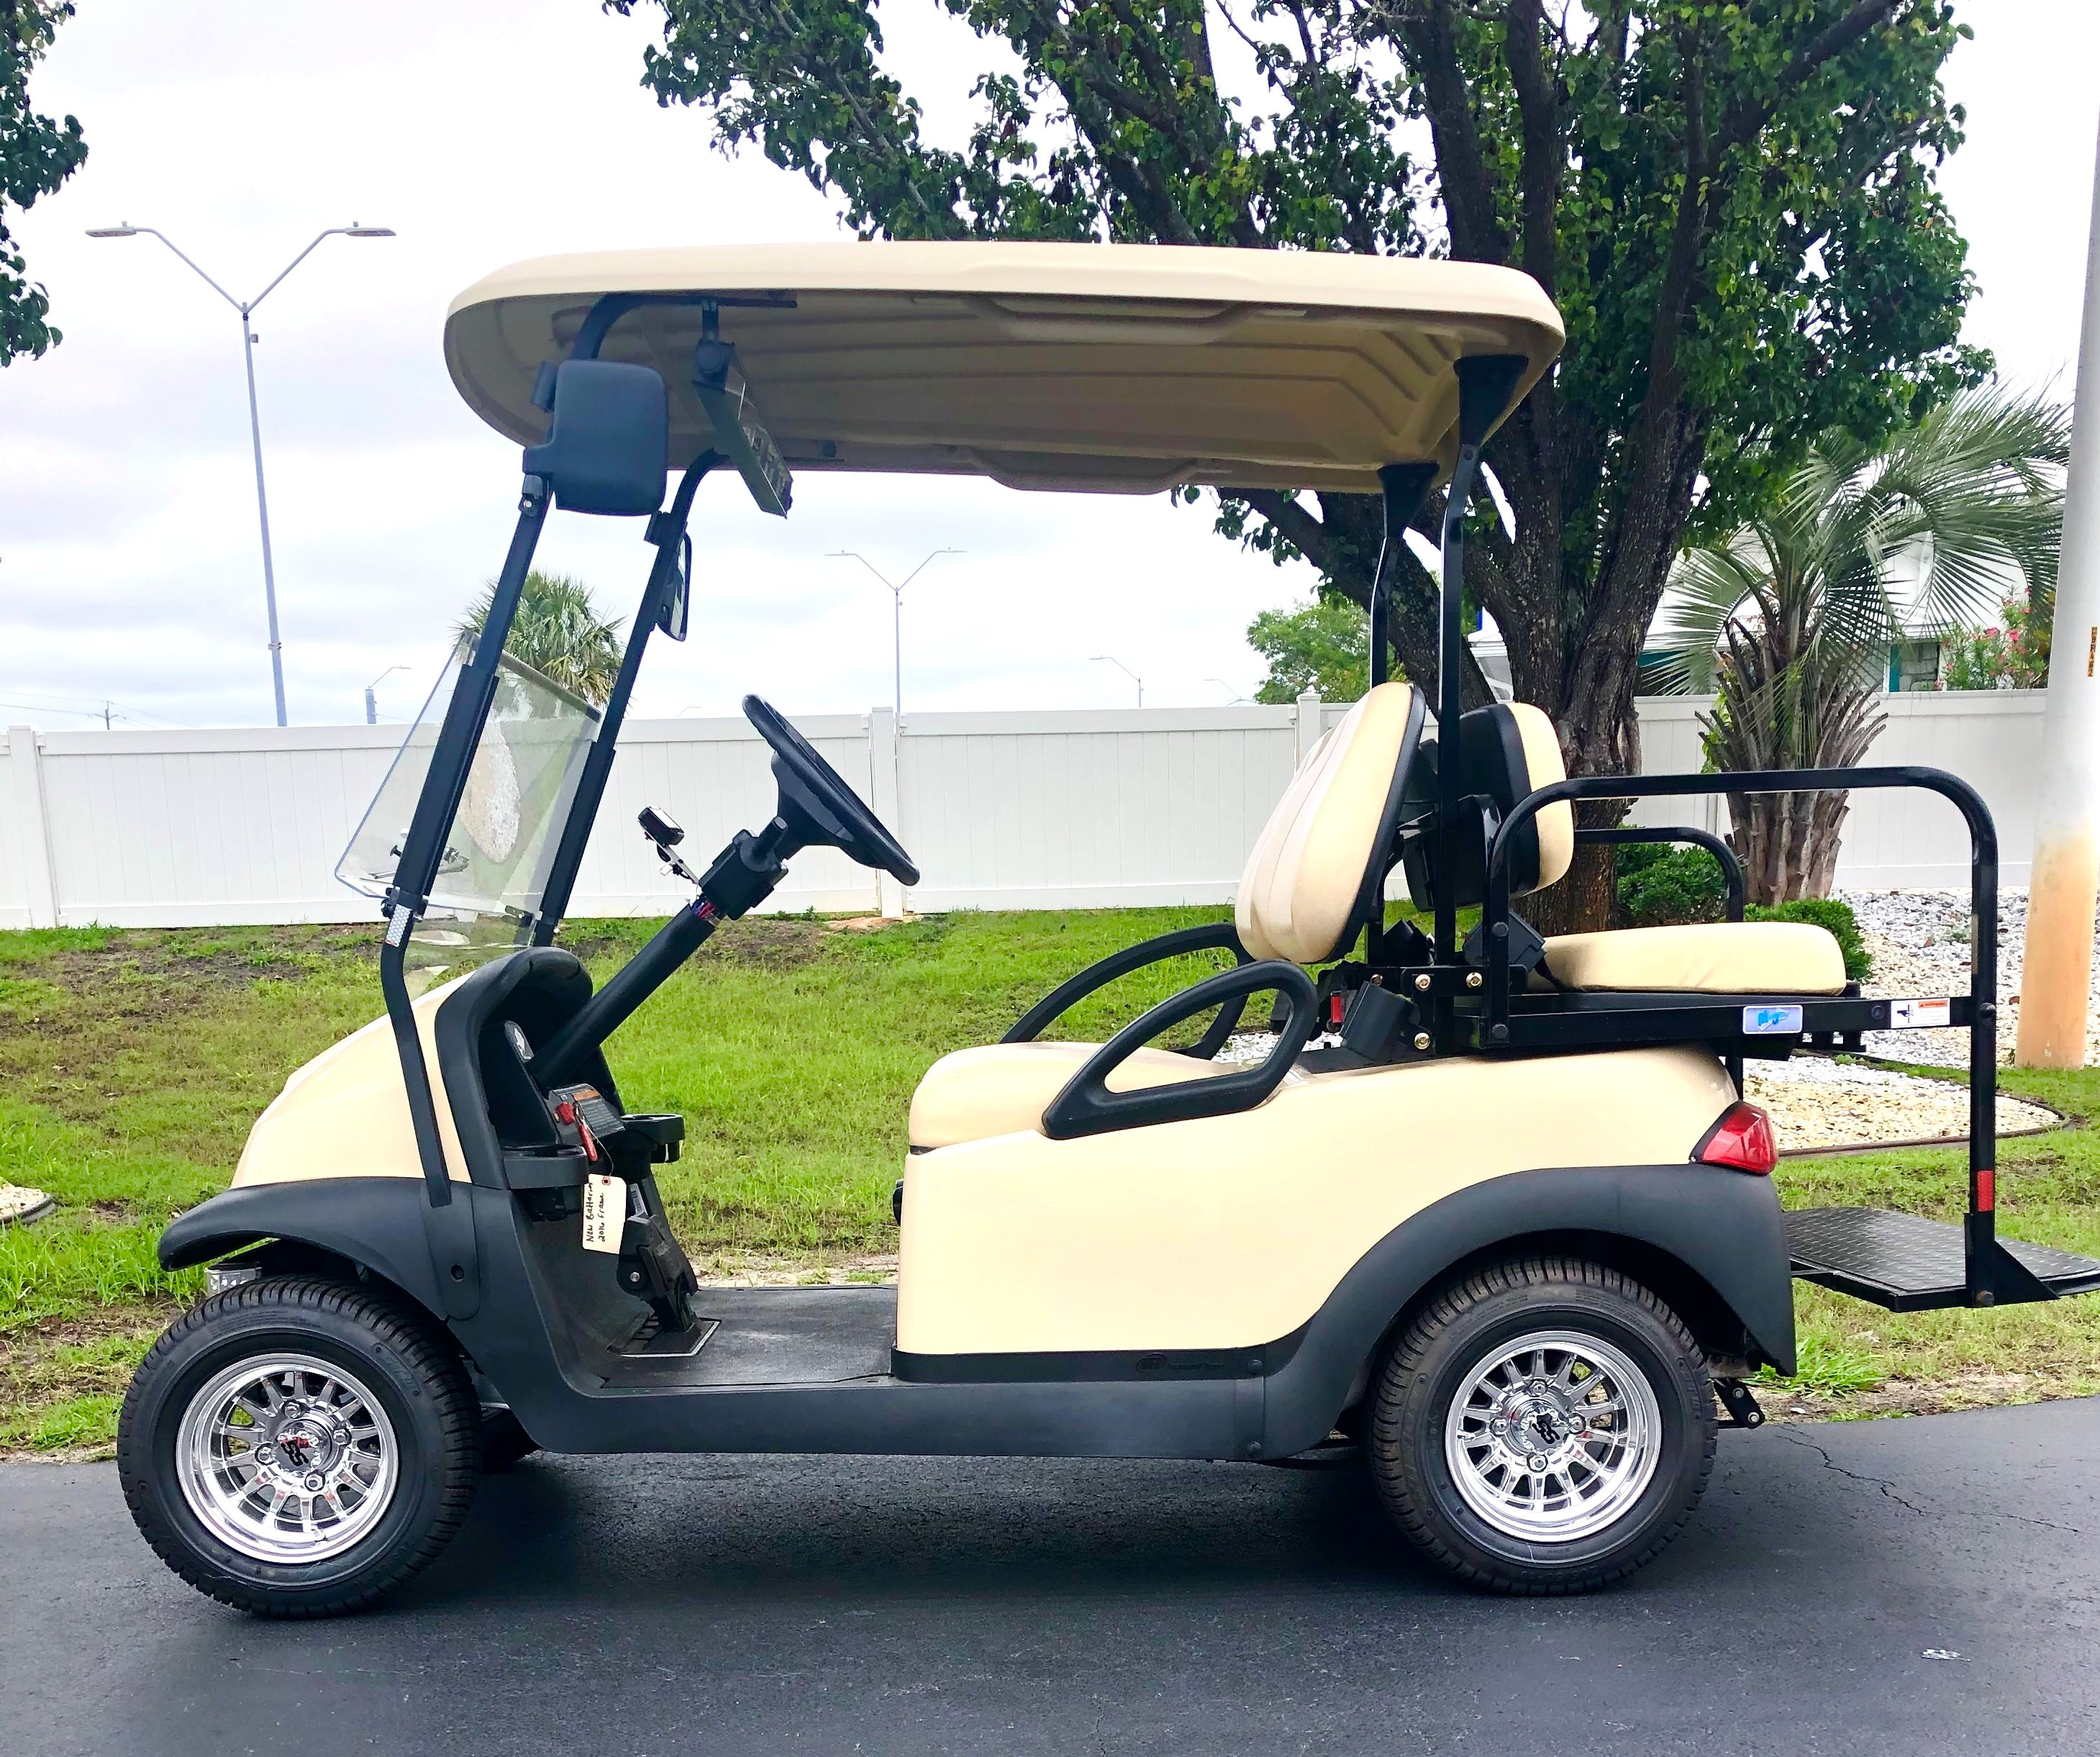 2020 Club Car 4 Passenger with Chrome Wheels